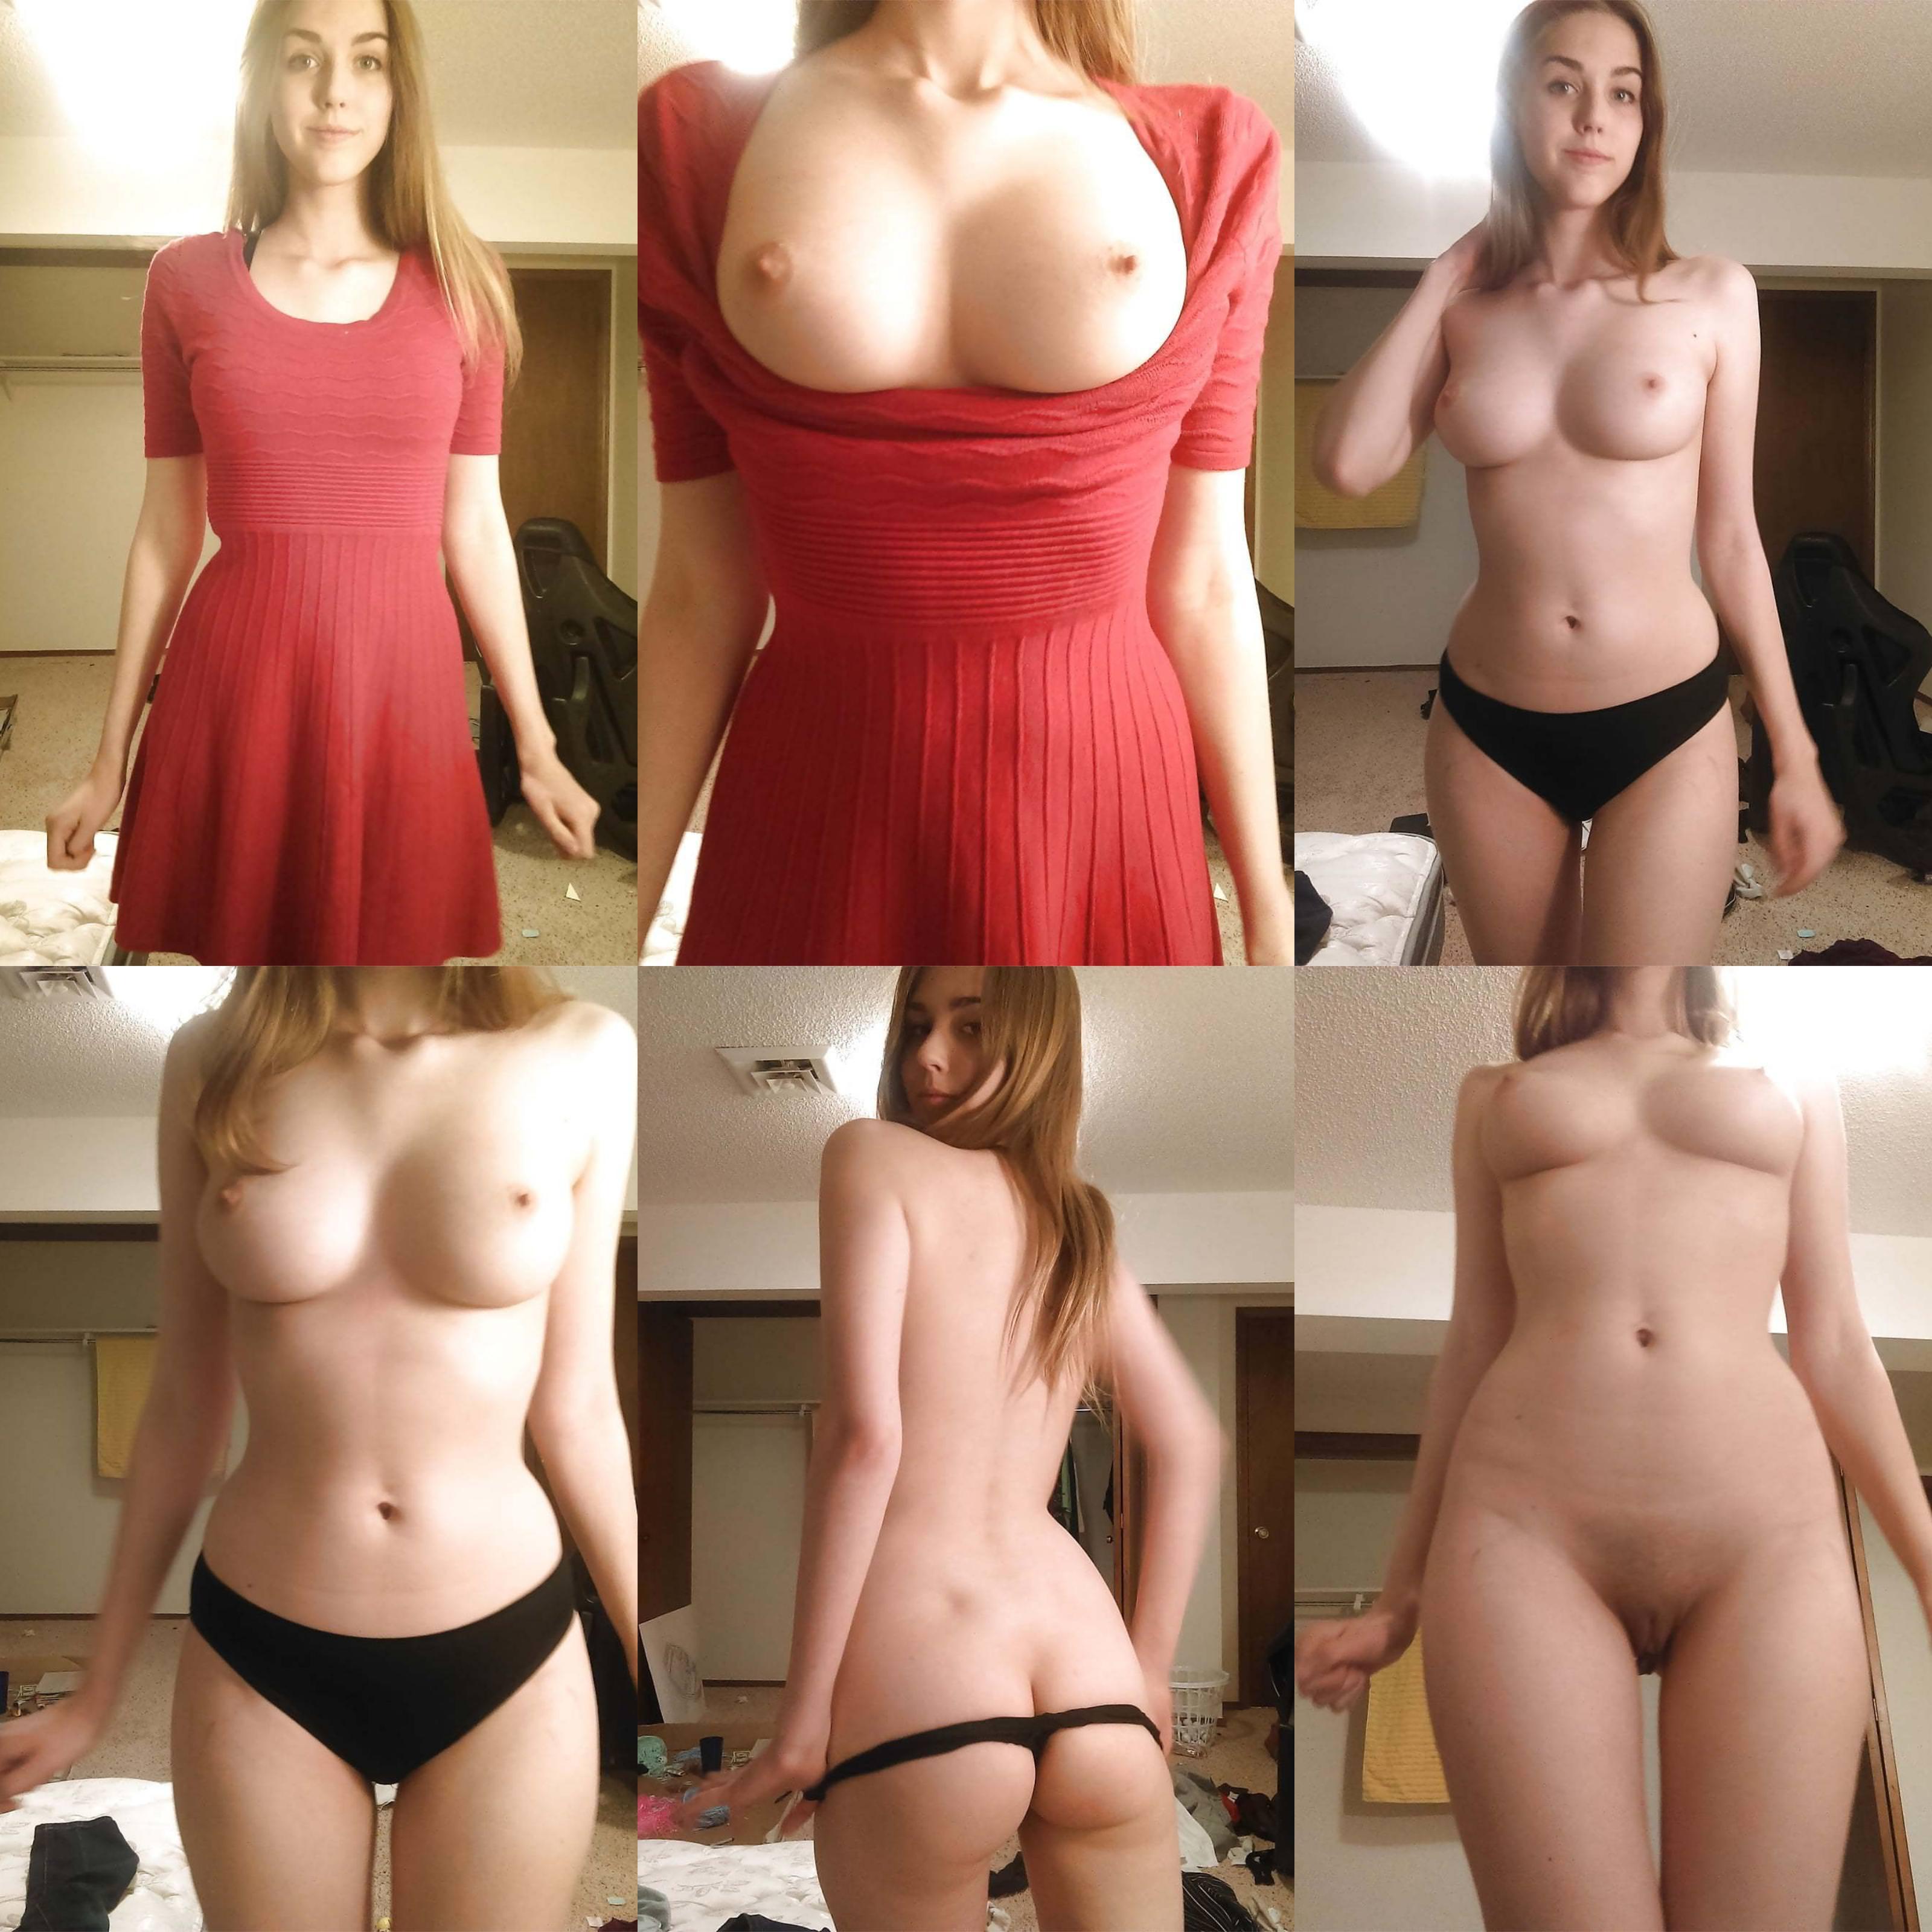 https://sexyna.org/wp-content/uploads/2019/10/Holky-před-a-po-76.jpg